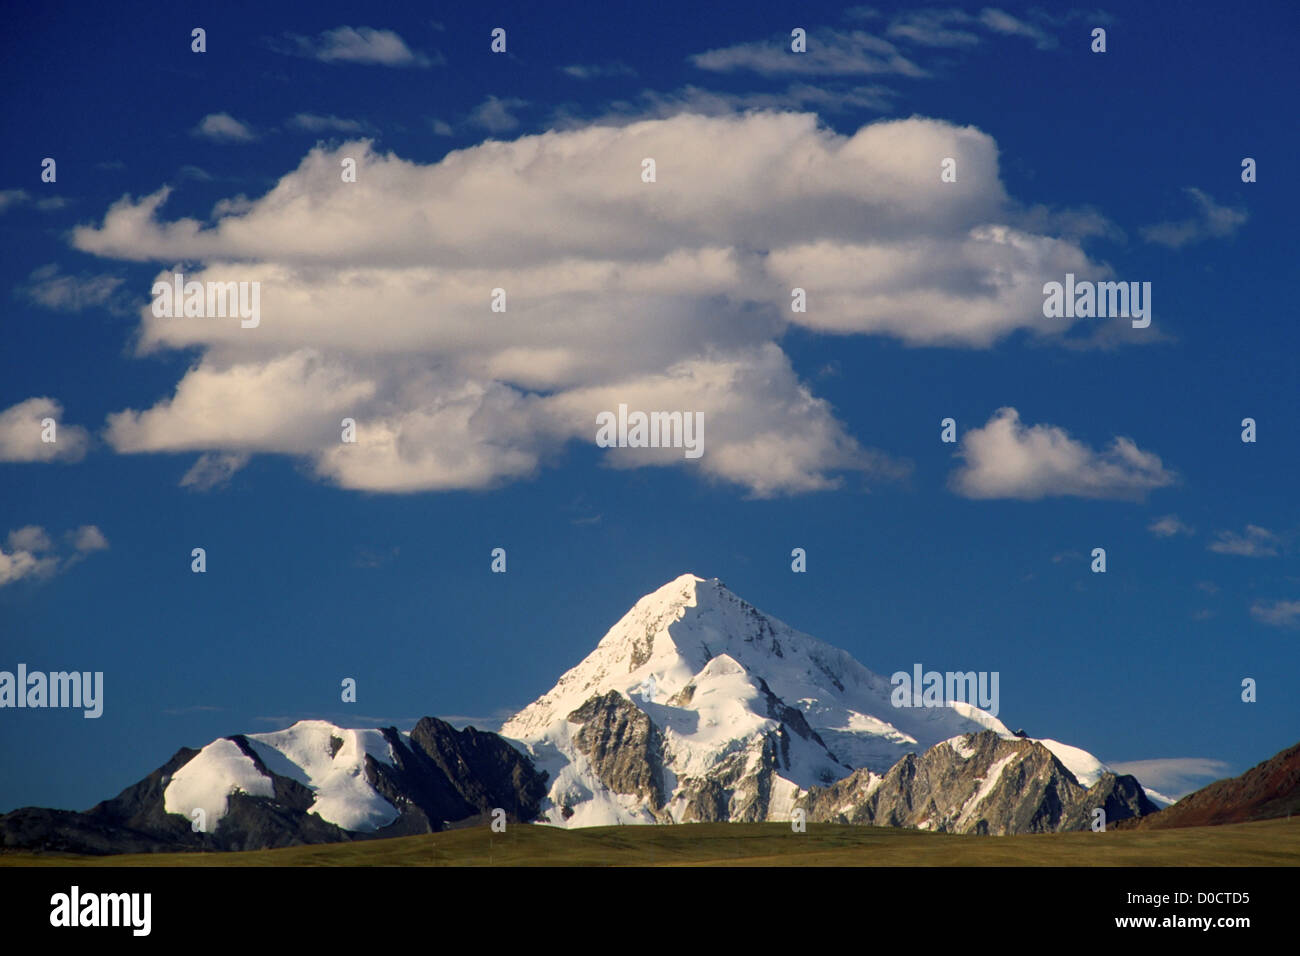 Nevado Huayna Potosi Rises Above the Bolivian Altiplano - Stock Image